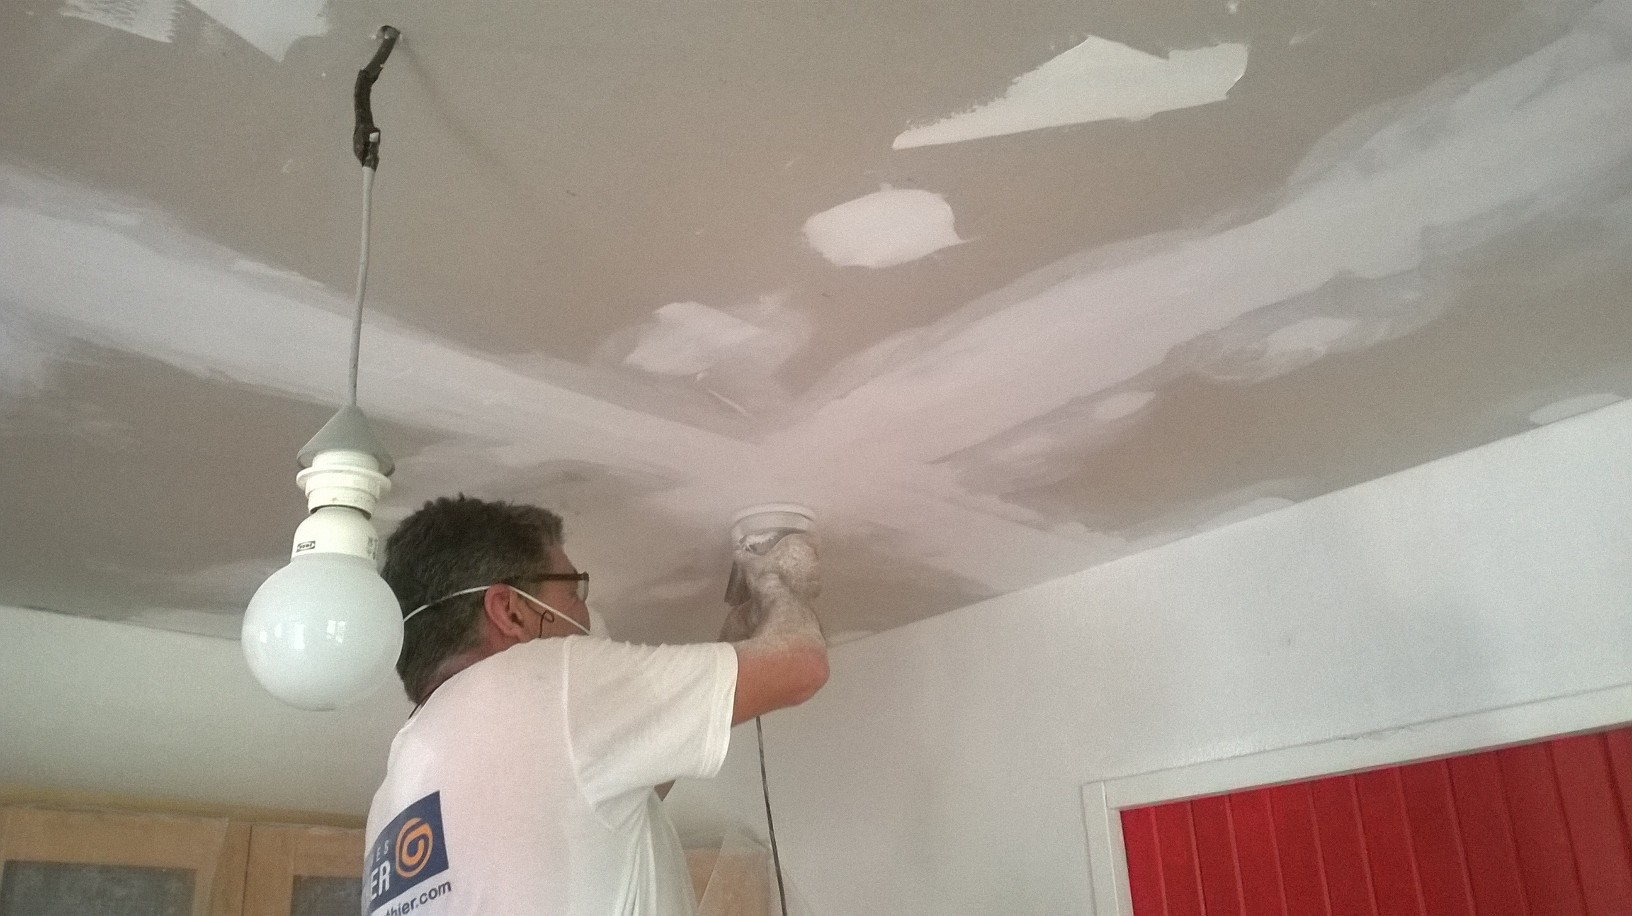 peintre montpellier peinture decorative renovation agencement peintre montpellier peinture. Black Bedroom Furniture Sets. Home Design Ideas